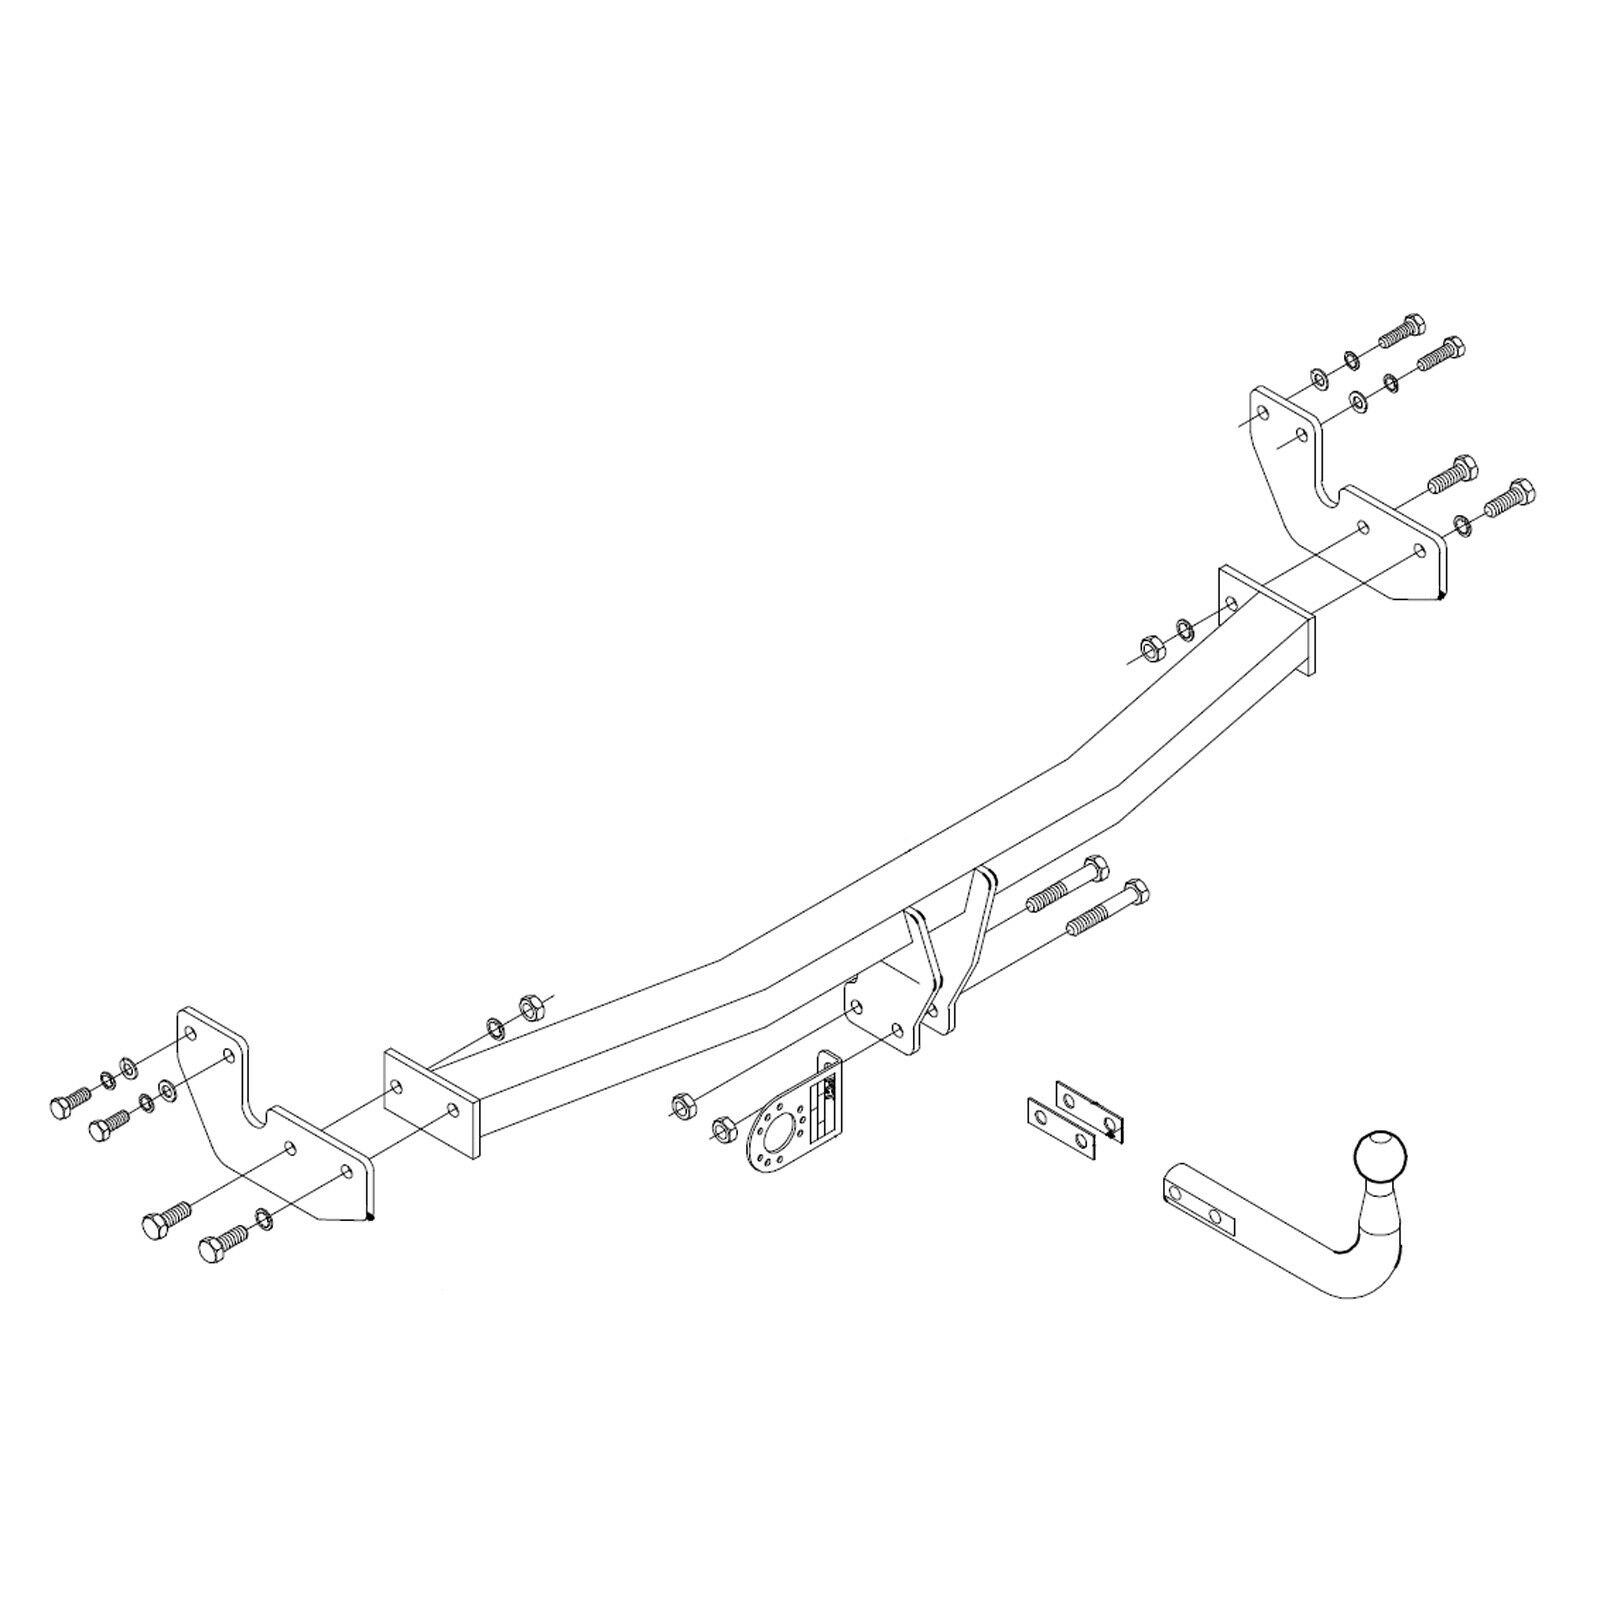 details about towbar for citroen c3 hatchback 2010 2016 swan neck tow bar [ 1600 x 1600 Pixel ]